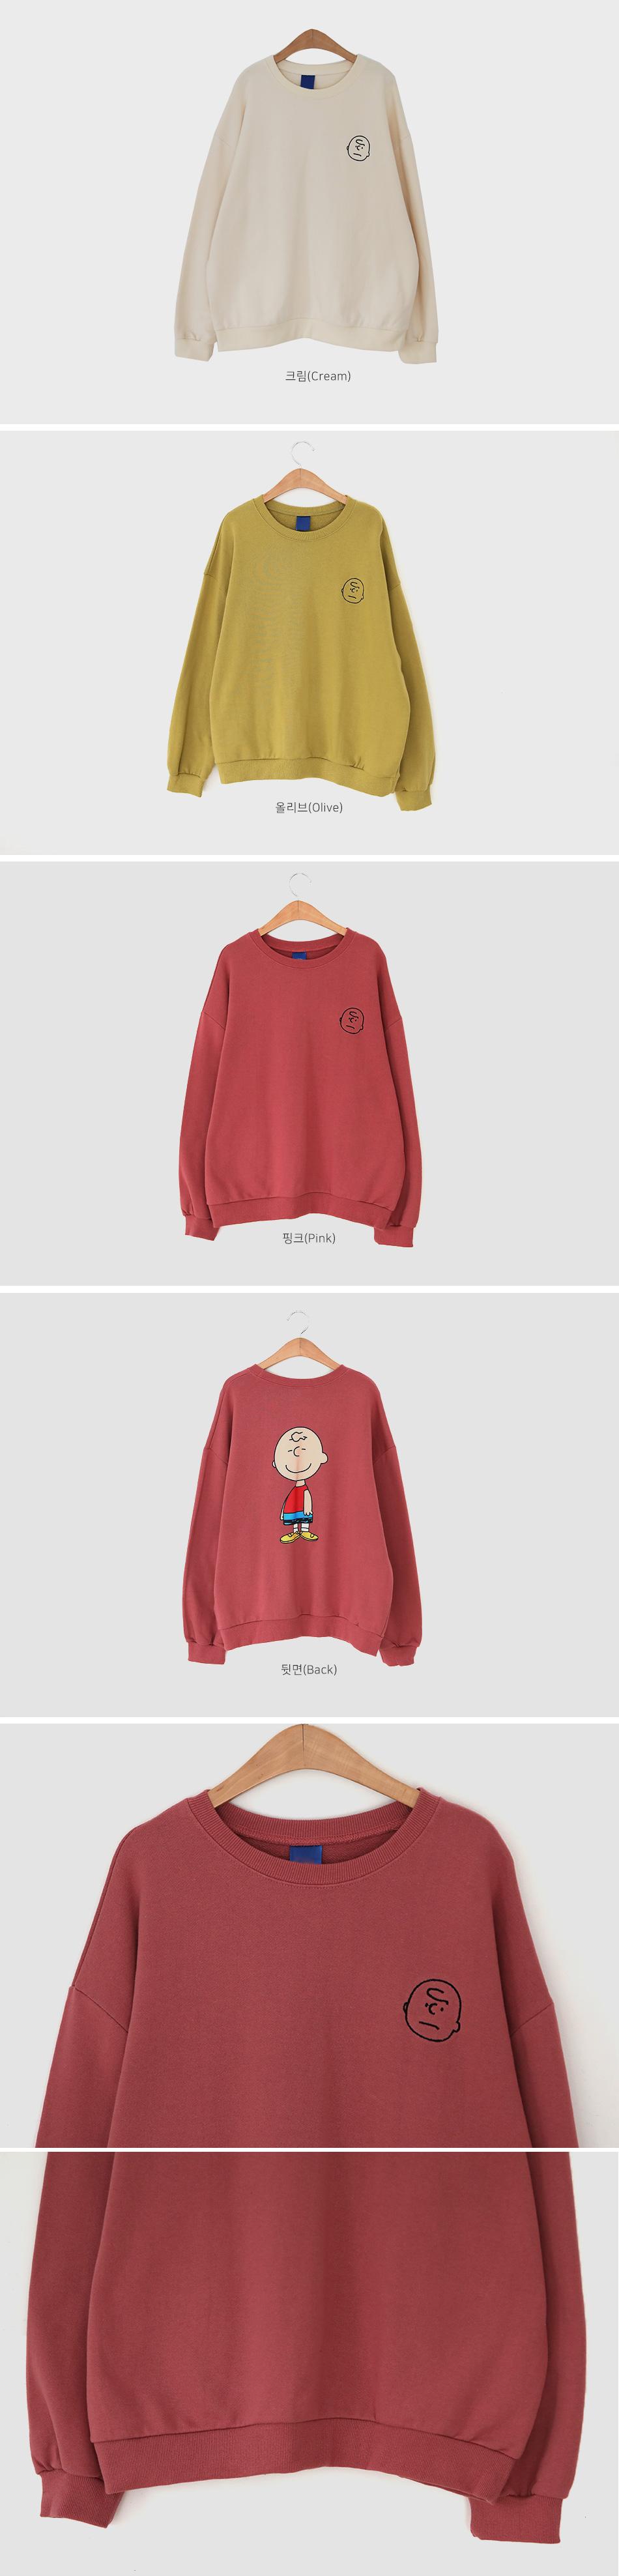 Snoopy Man to Man T-Shirt